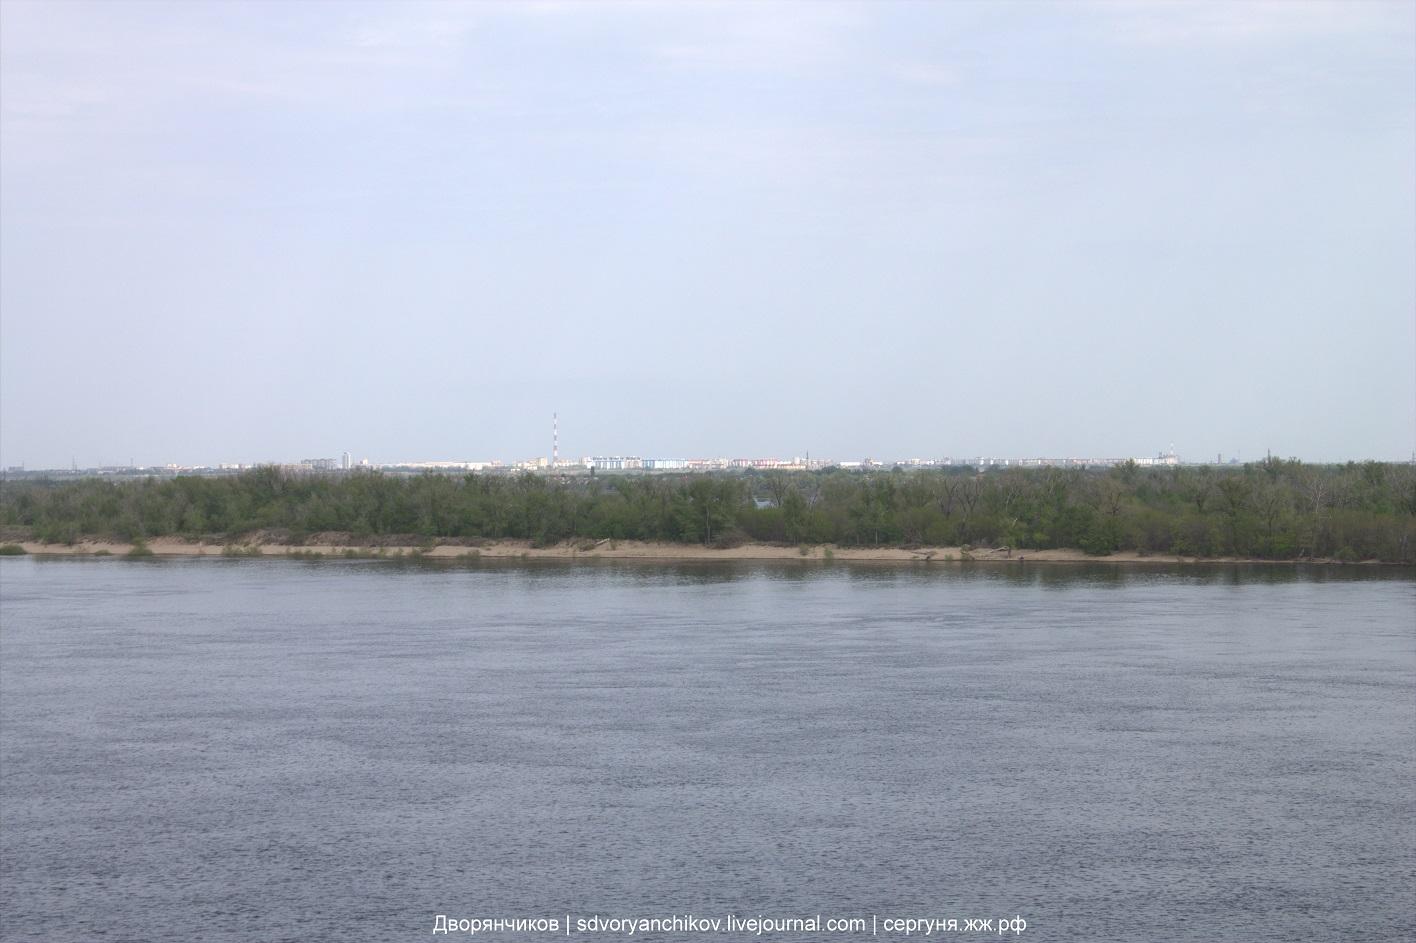 Волга - 3 мая 2017 - Волгоград ТЗР